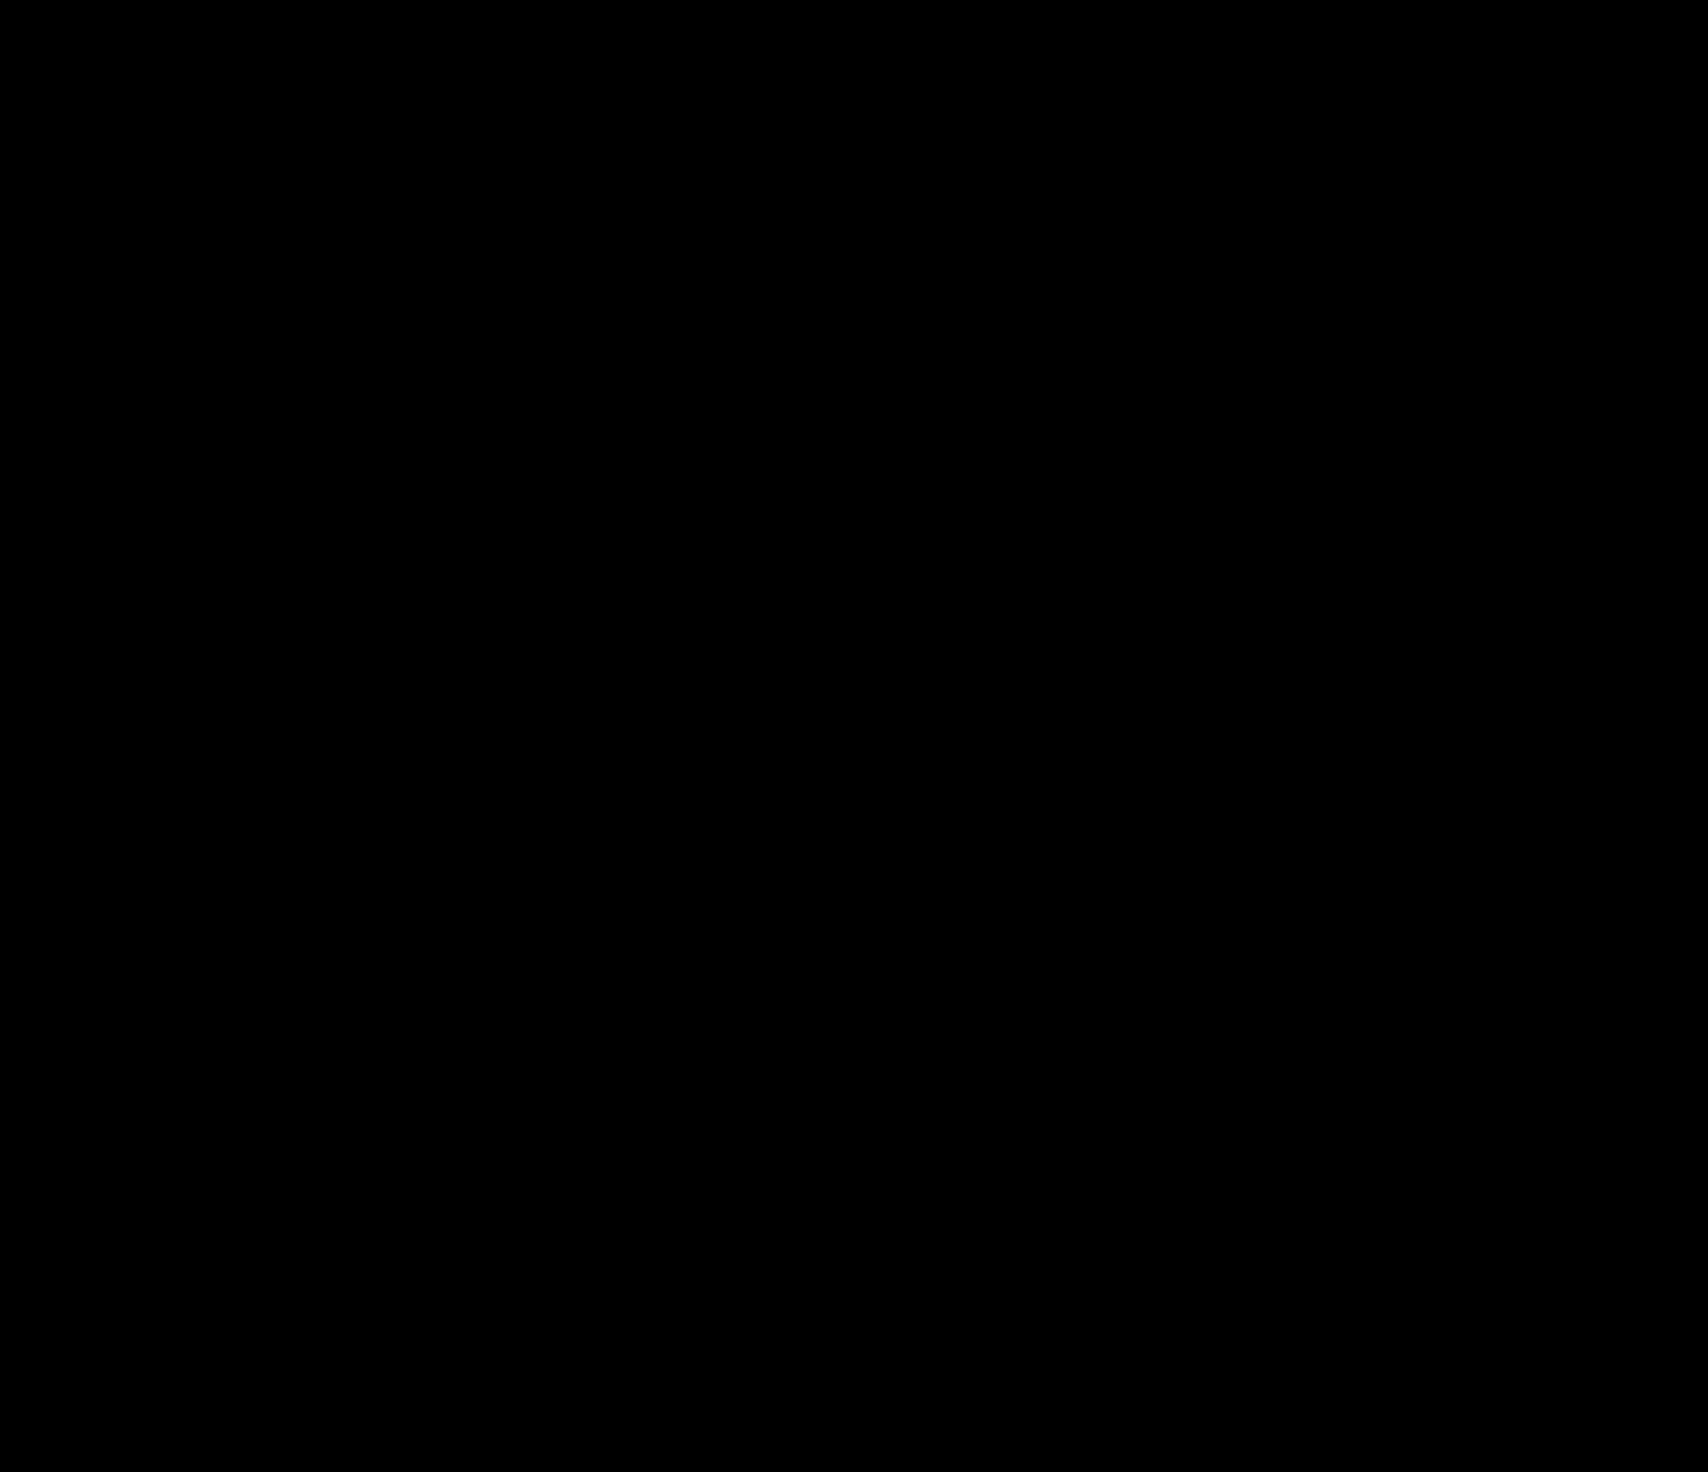 https://eqoxdgod6do.exactdn.com/wp-content/uploads/2021/02/Office2-scaled-e1612977175552.jpeg?strip=all&lossy=1&w=1920&ssl=1